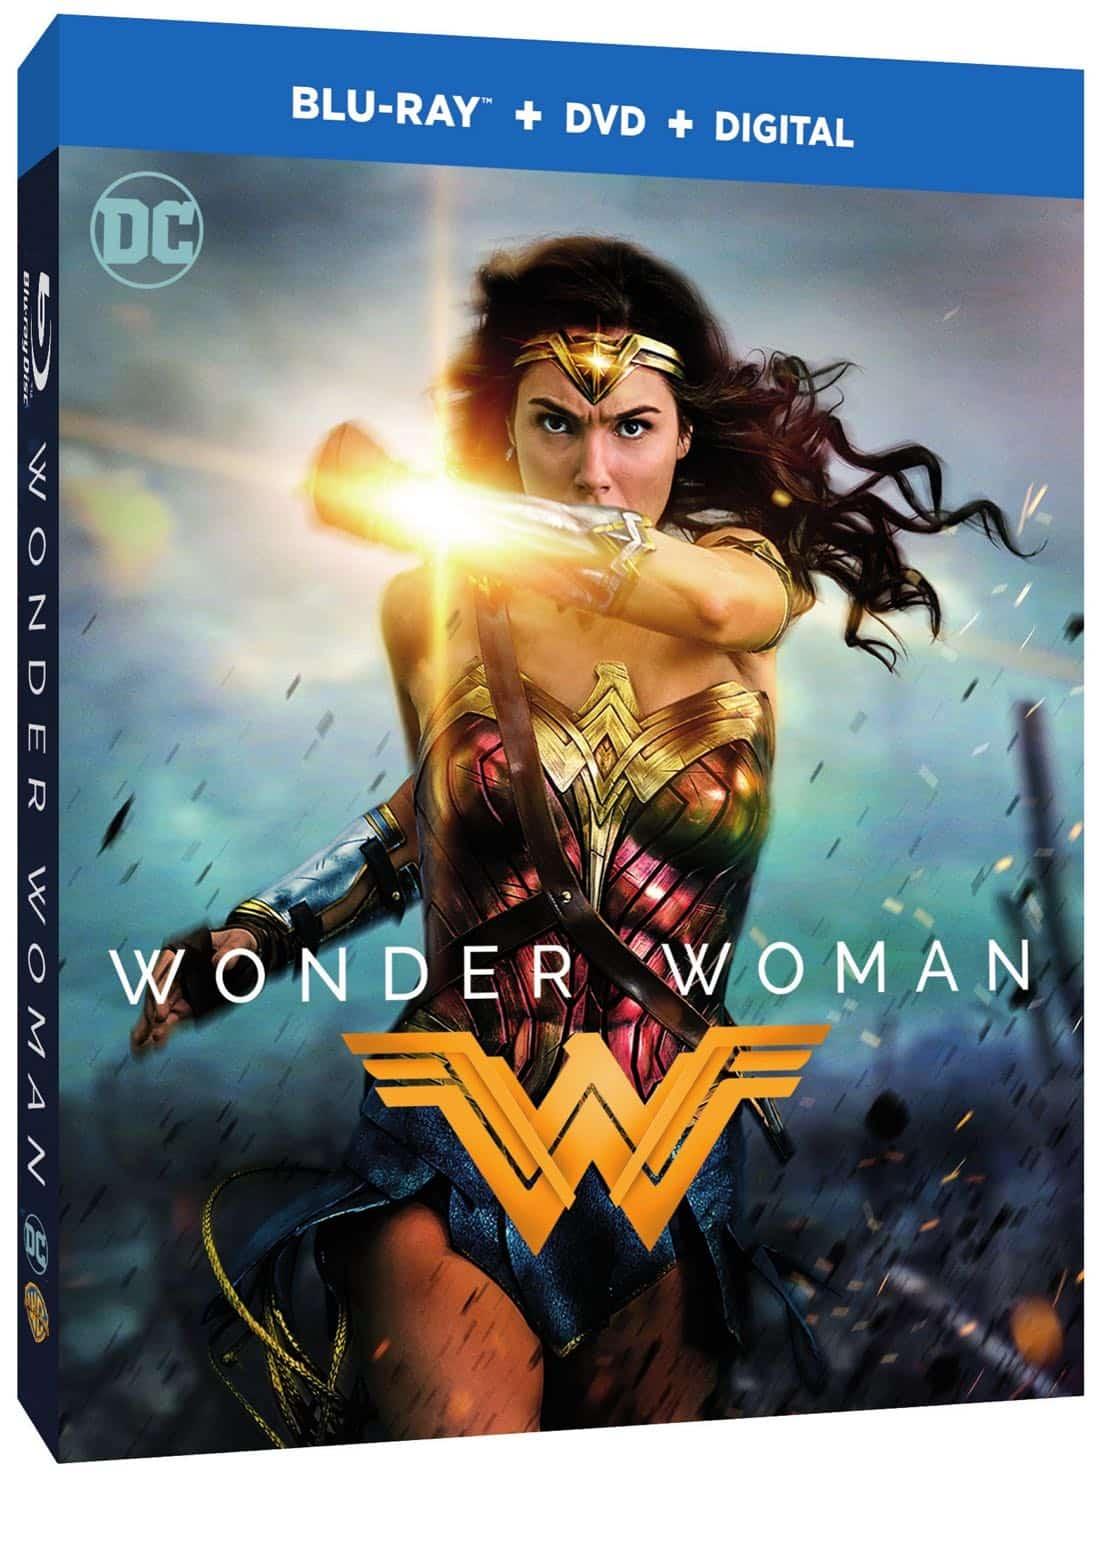 Wonder-Woman-Bluray-dvd-digital-cover